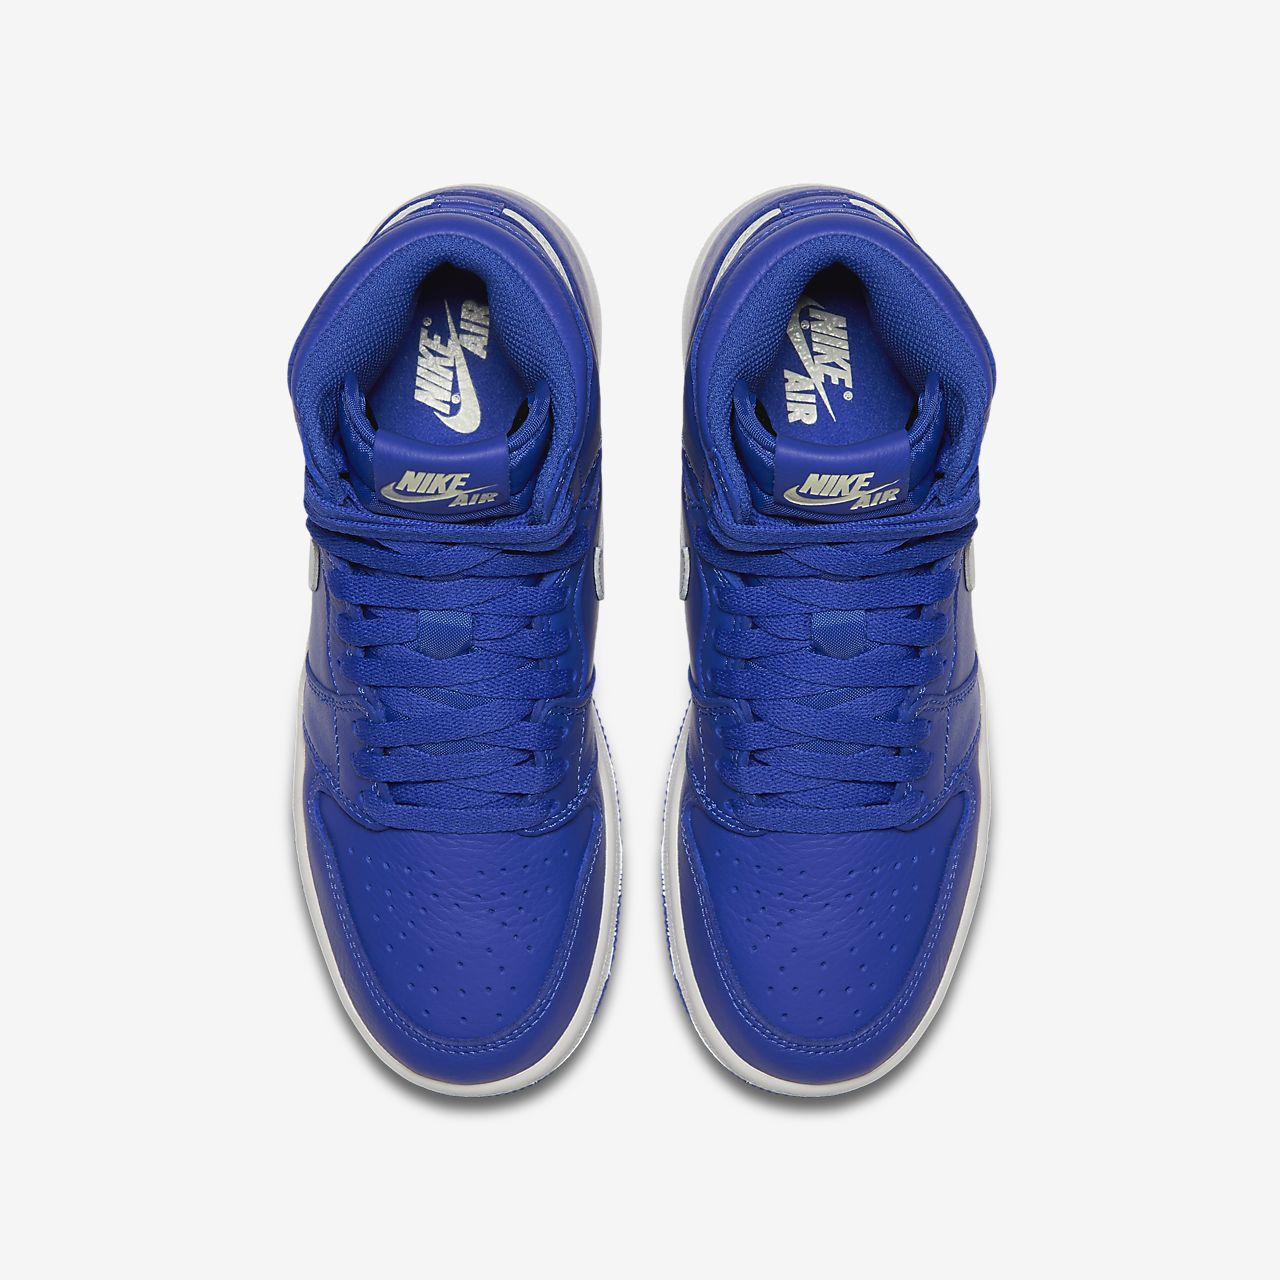 7a95781d6 Air Jordan 1 Retro High OG Boys  Shoe. Nike.com IN